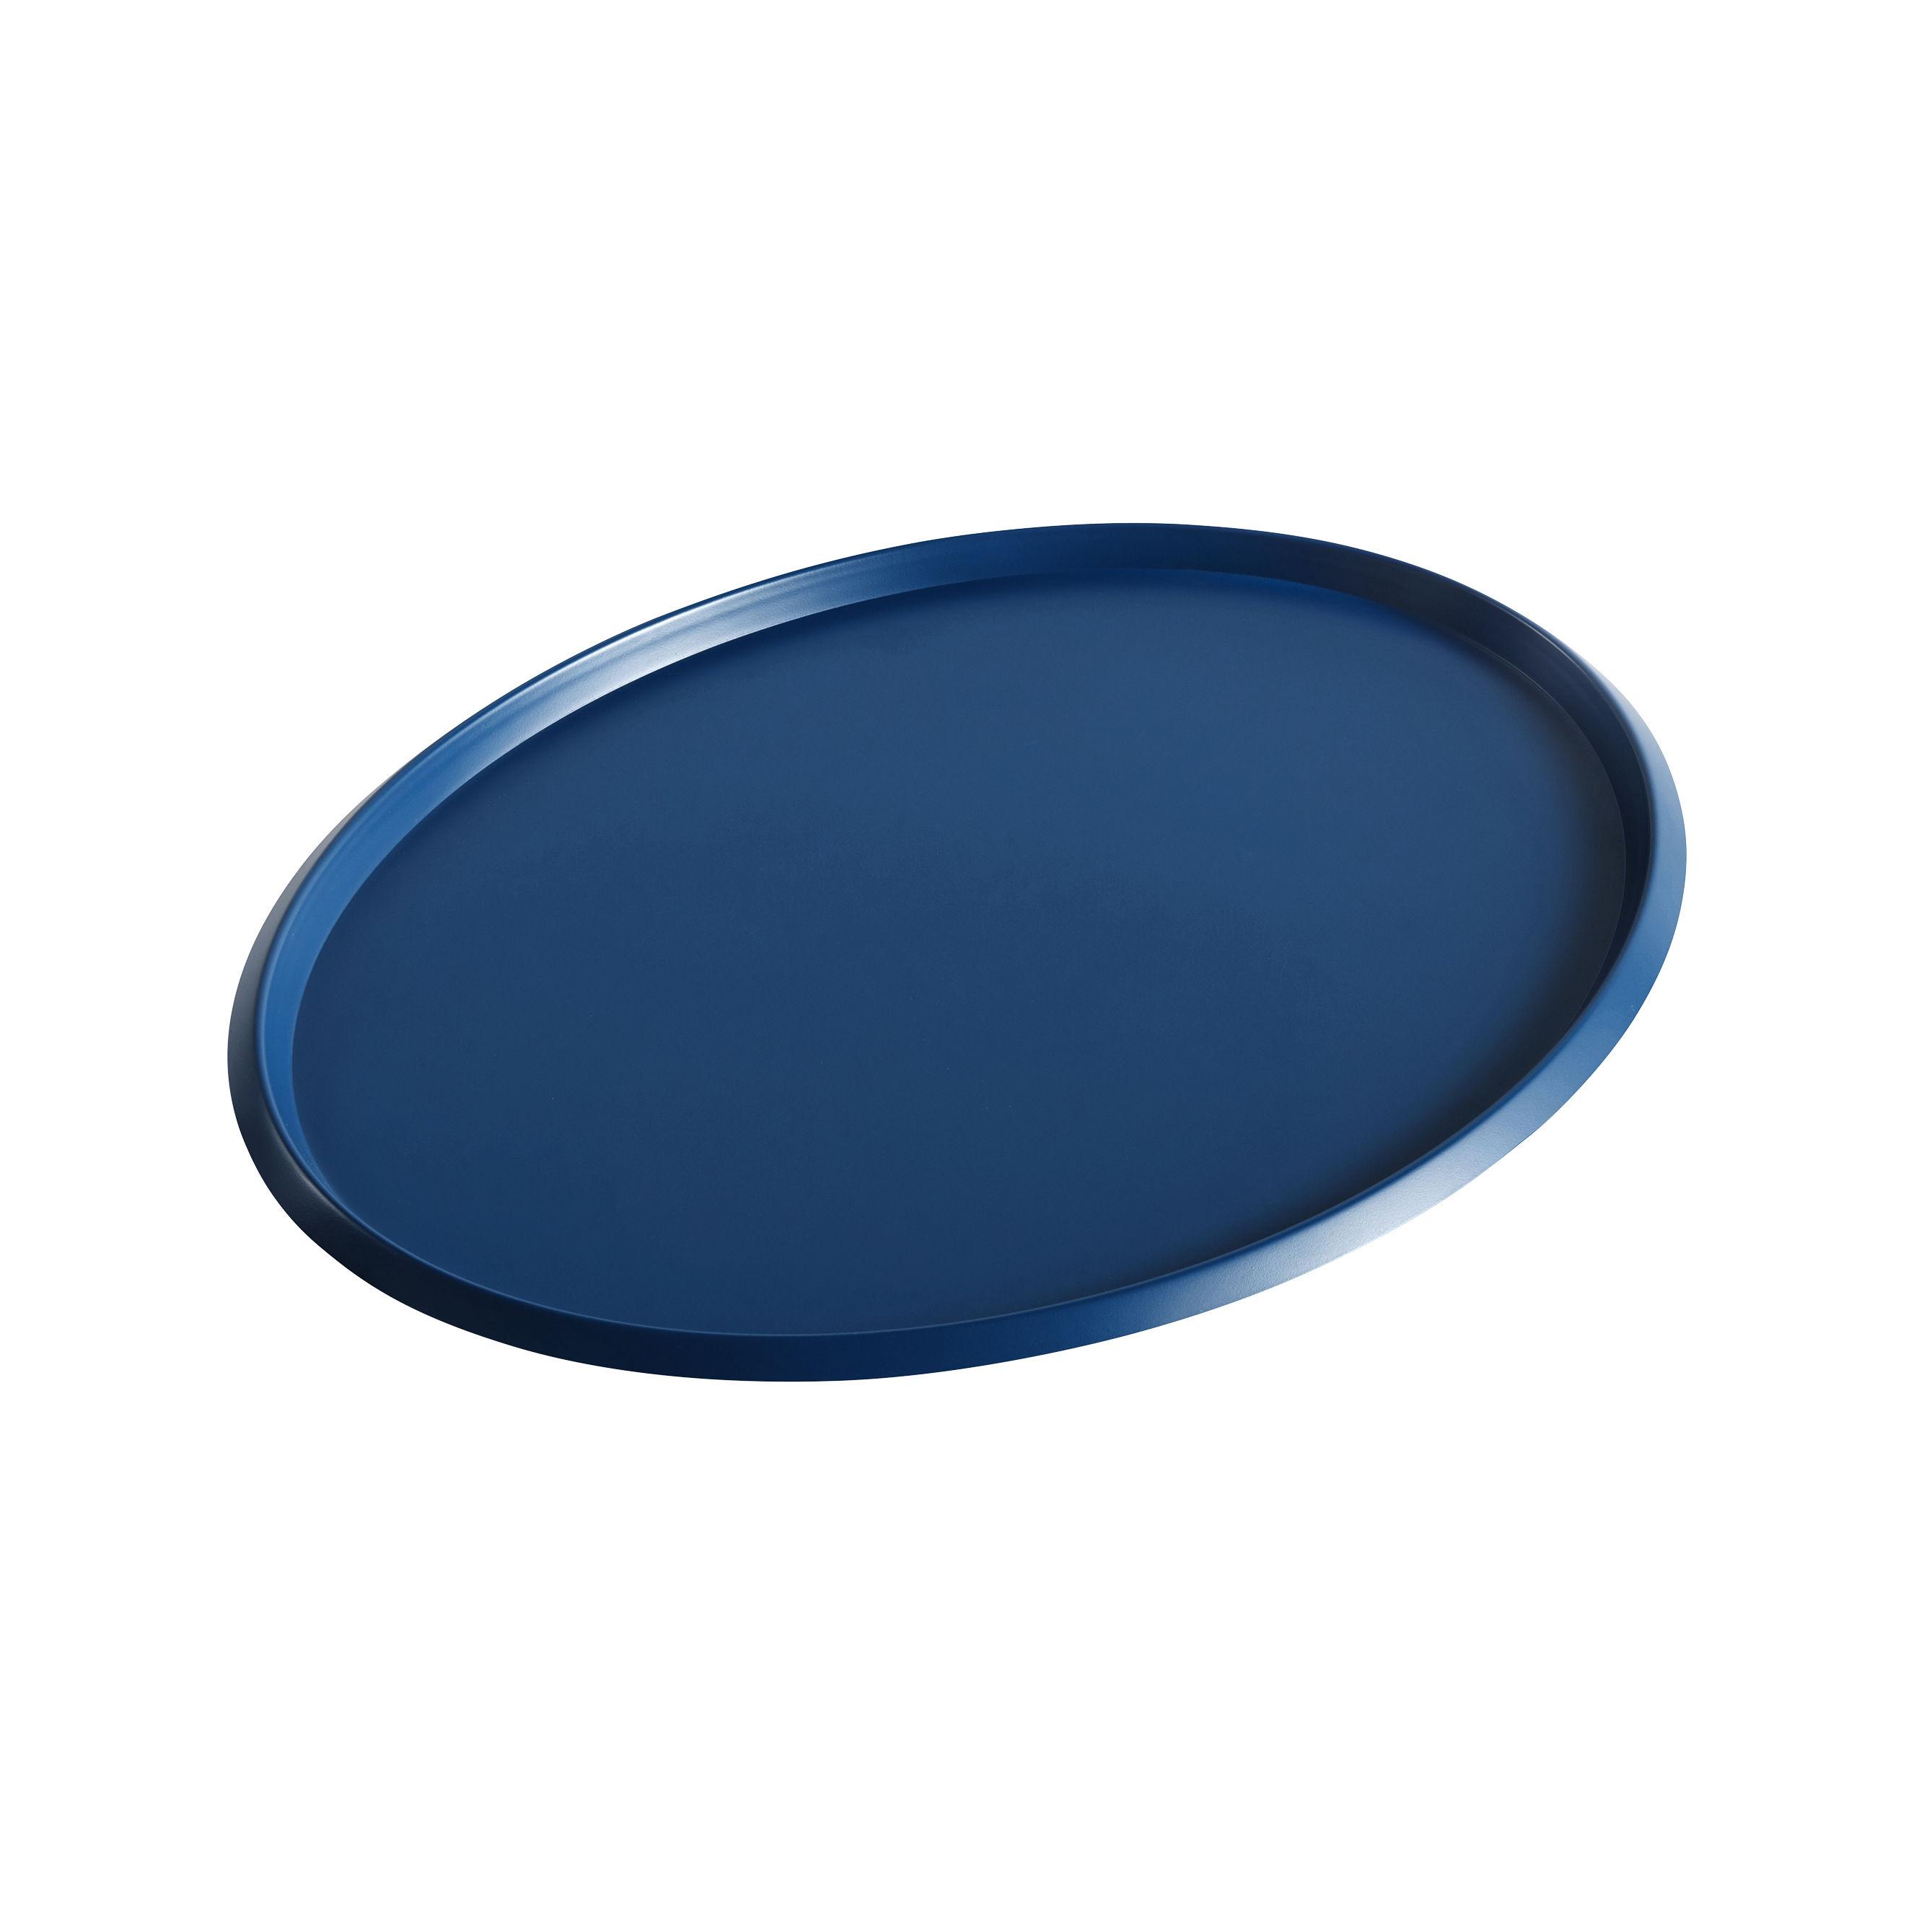 Tableware - Trays - Ellipse Large Tray - / 39 x 31 cm - Metal by Hay - Blue - Painted steel